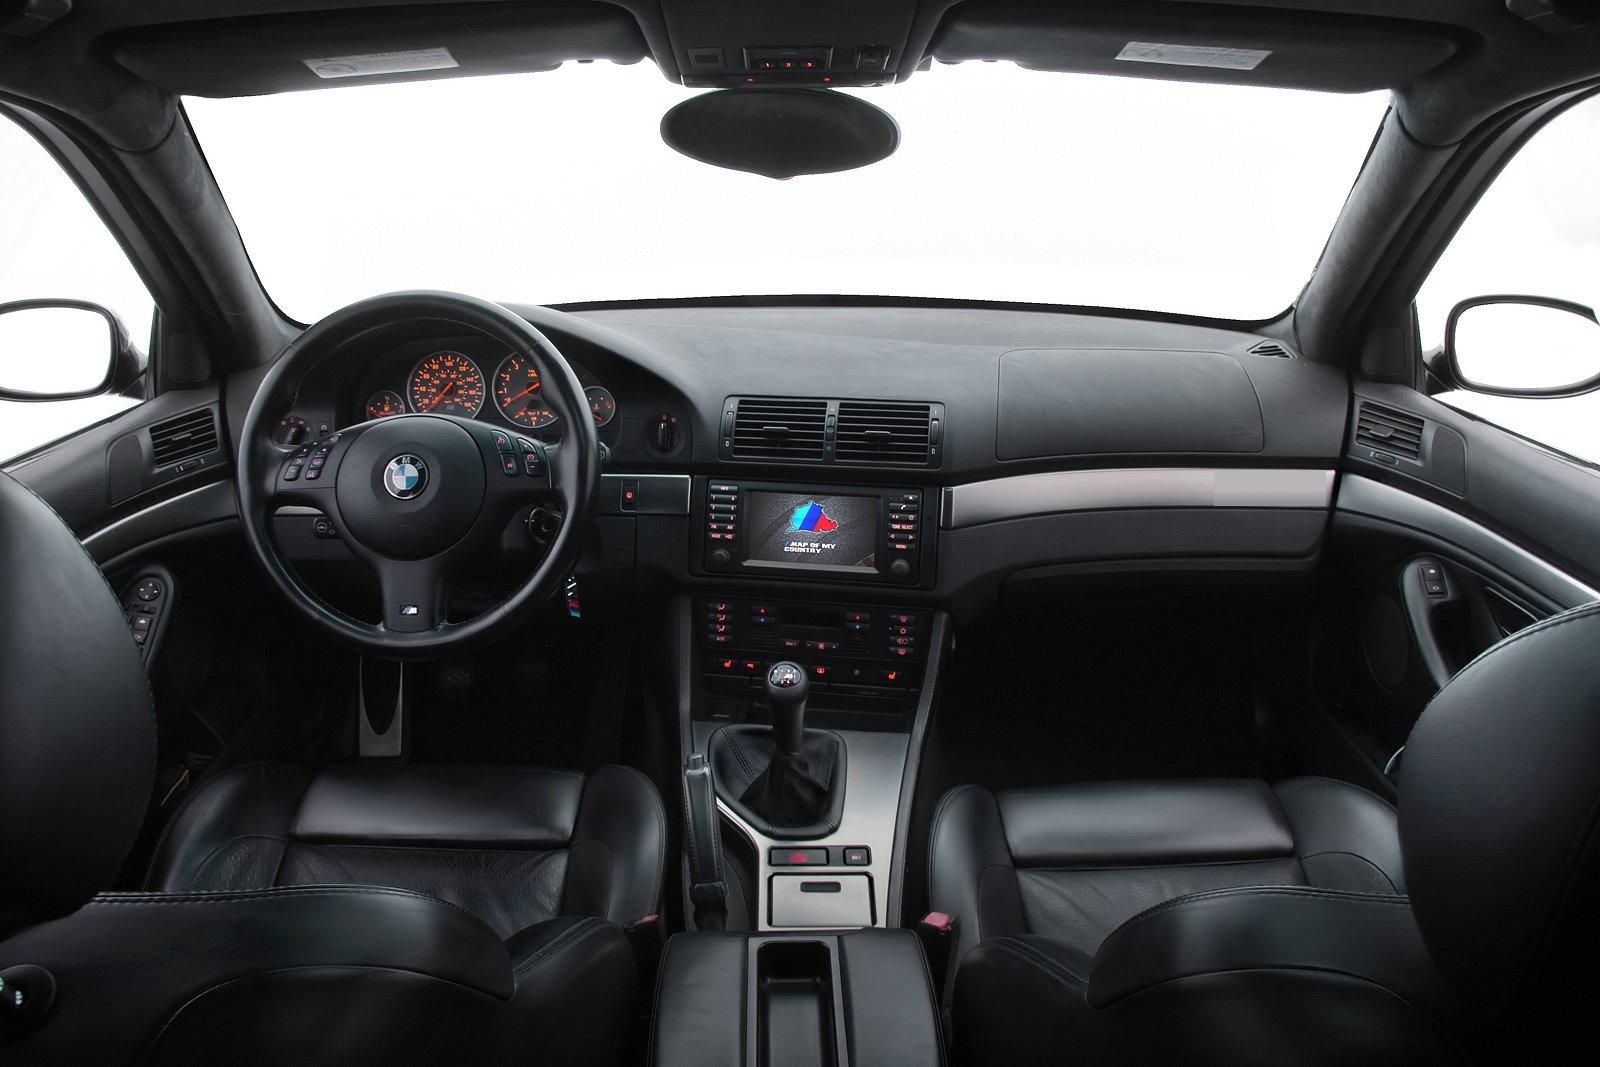 Bmw E39 M5 Шедевр автомобилестроения